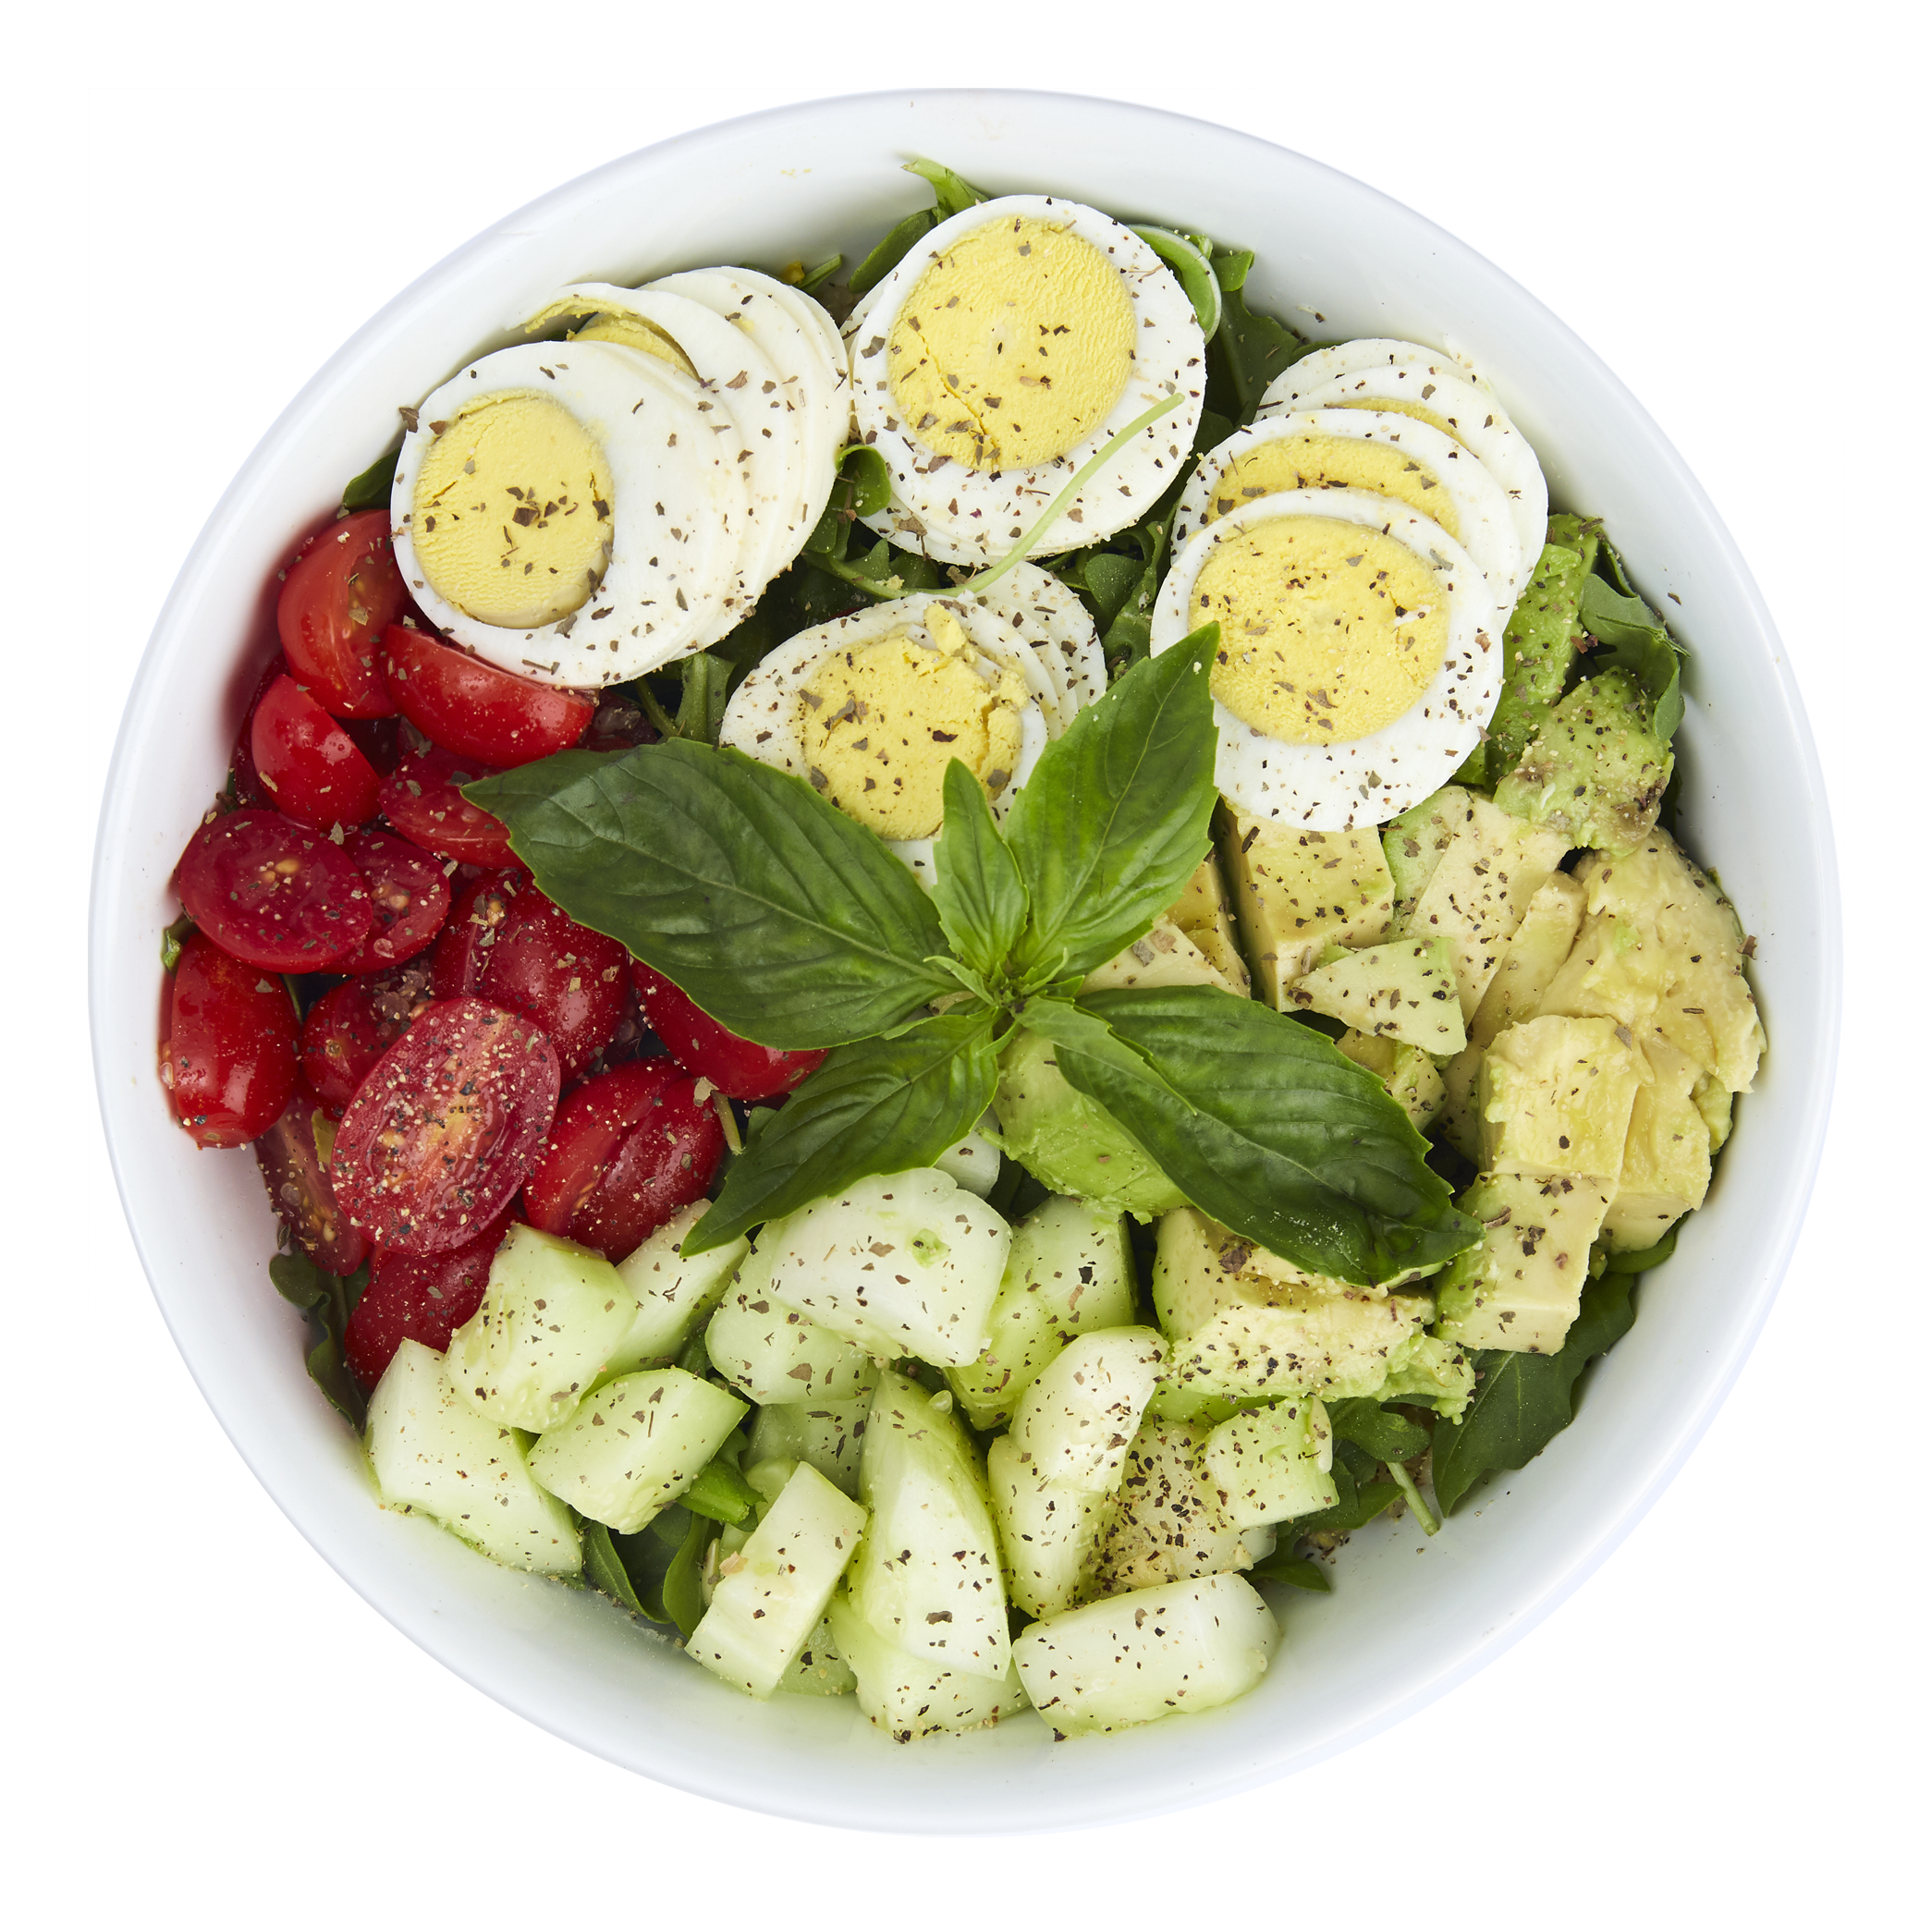 Quinoa Egg Bowl  - $10.50  Quinoa, arugula, tomatoes, cucumber, avocado, egg, olive oil, basil